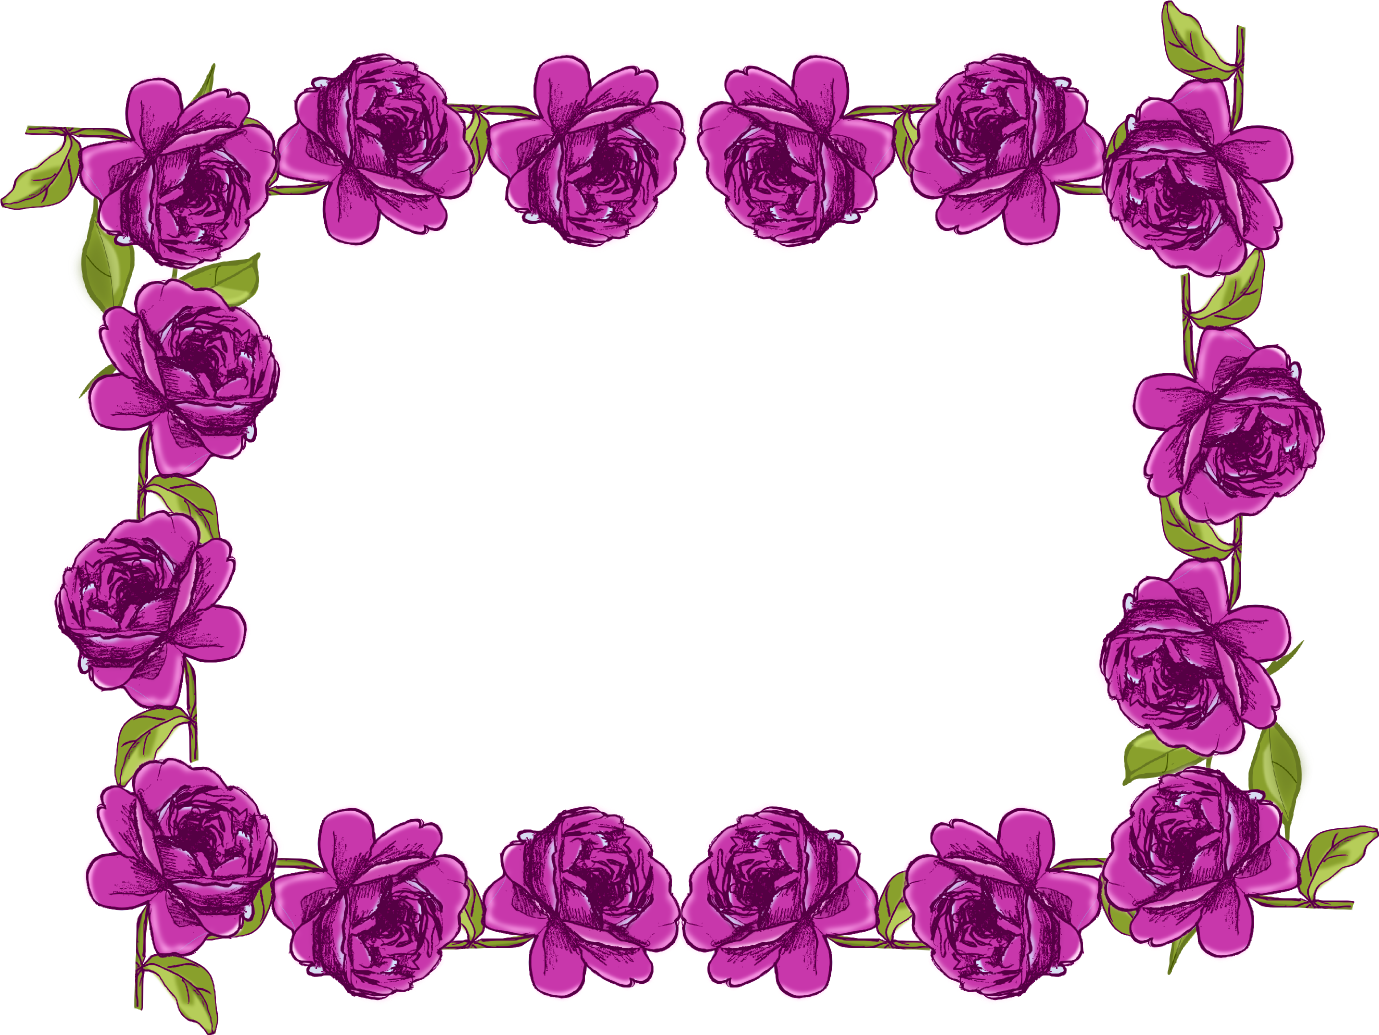 Purple flower border clipart vector royalty free 28+ Collection of Purple Flower Border Clipart | High quality, free ... vector royalty free